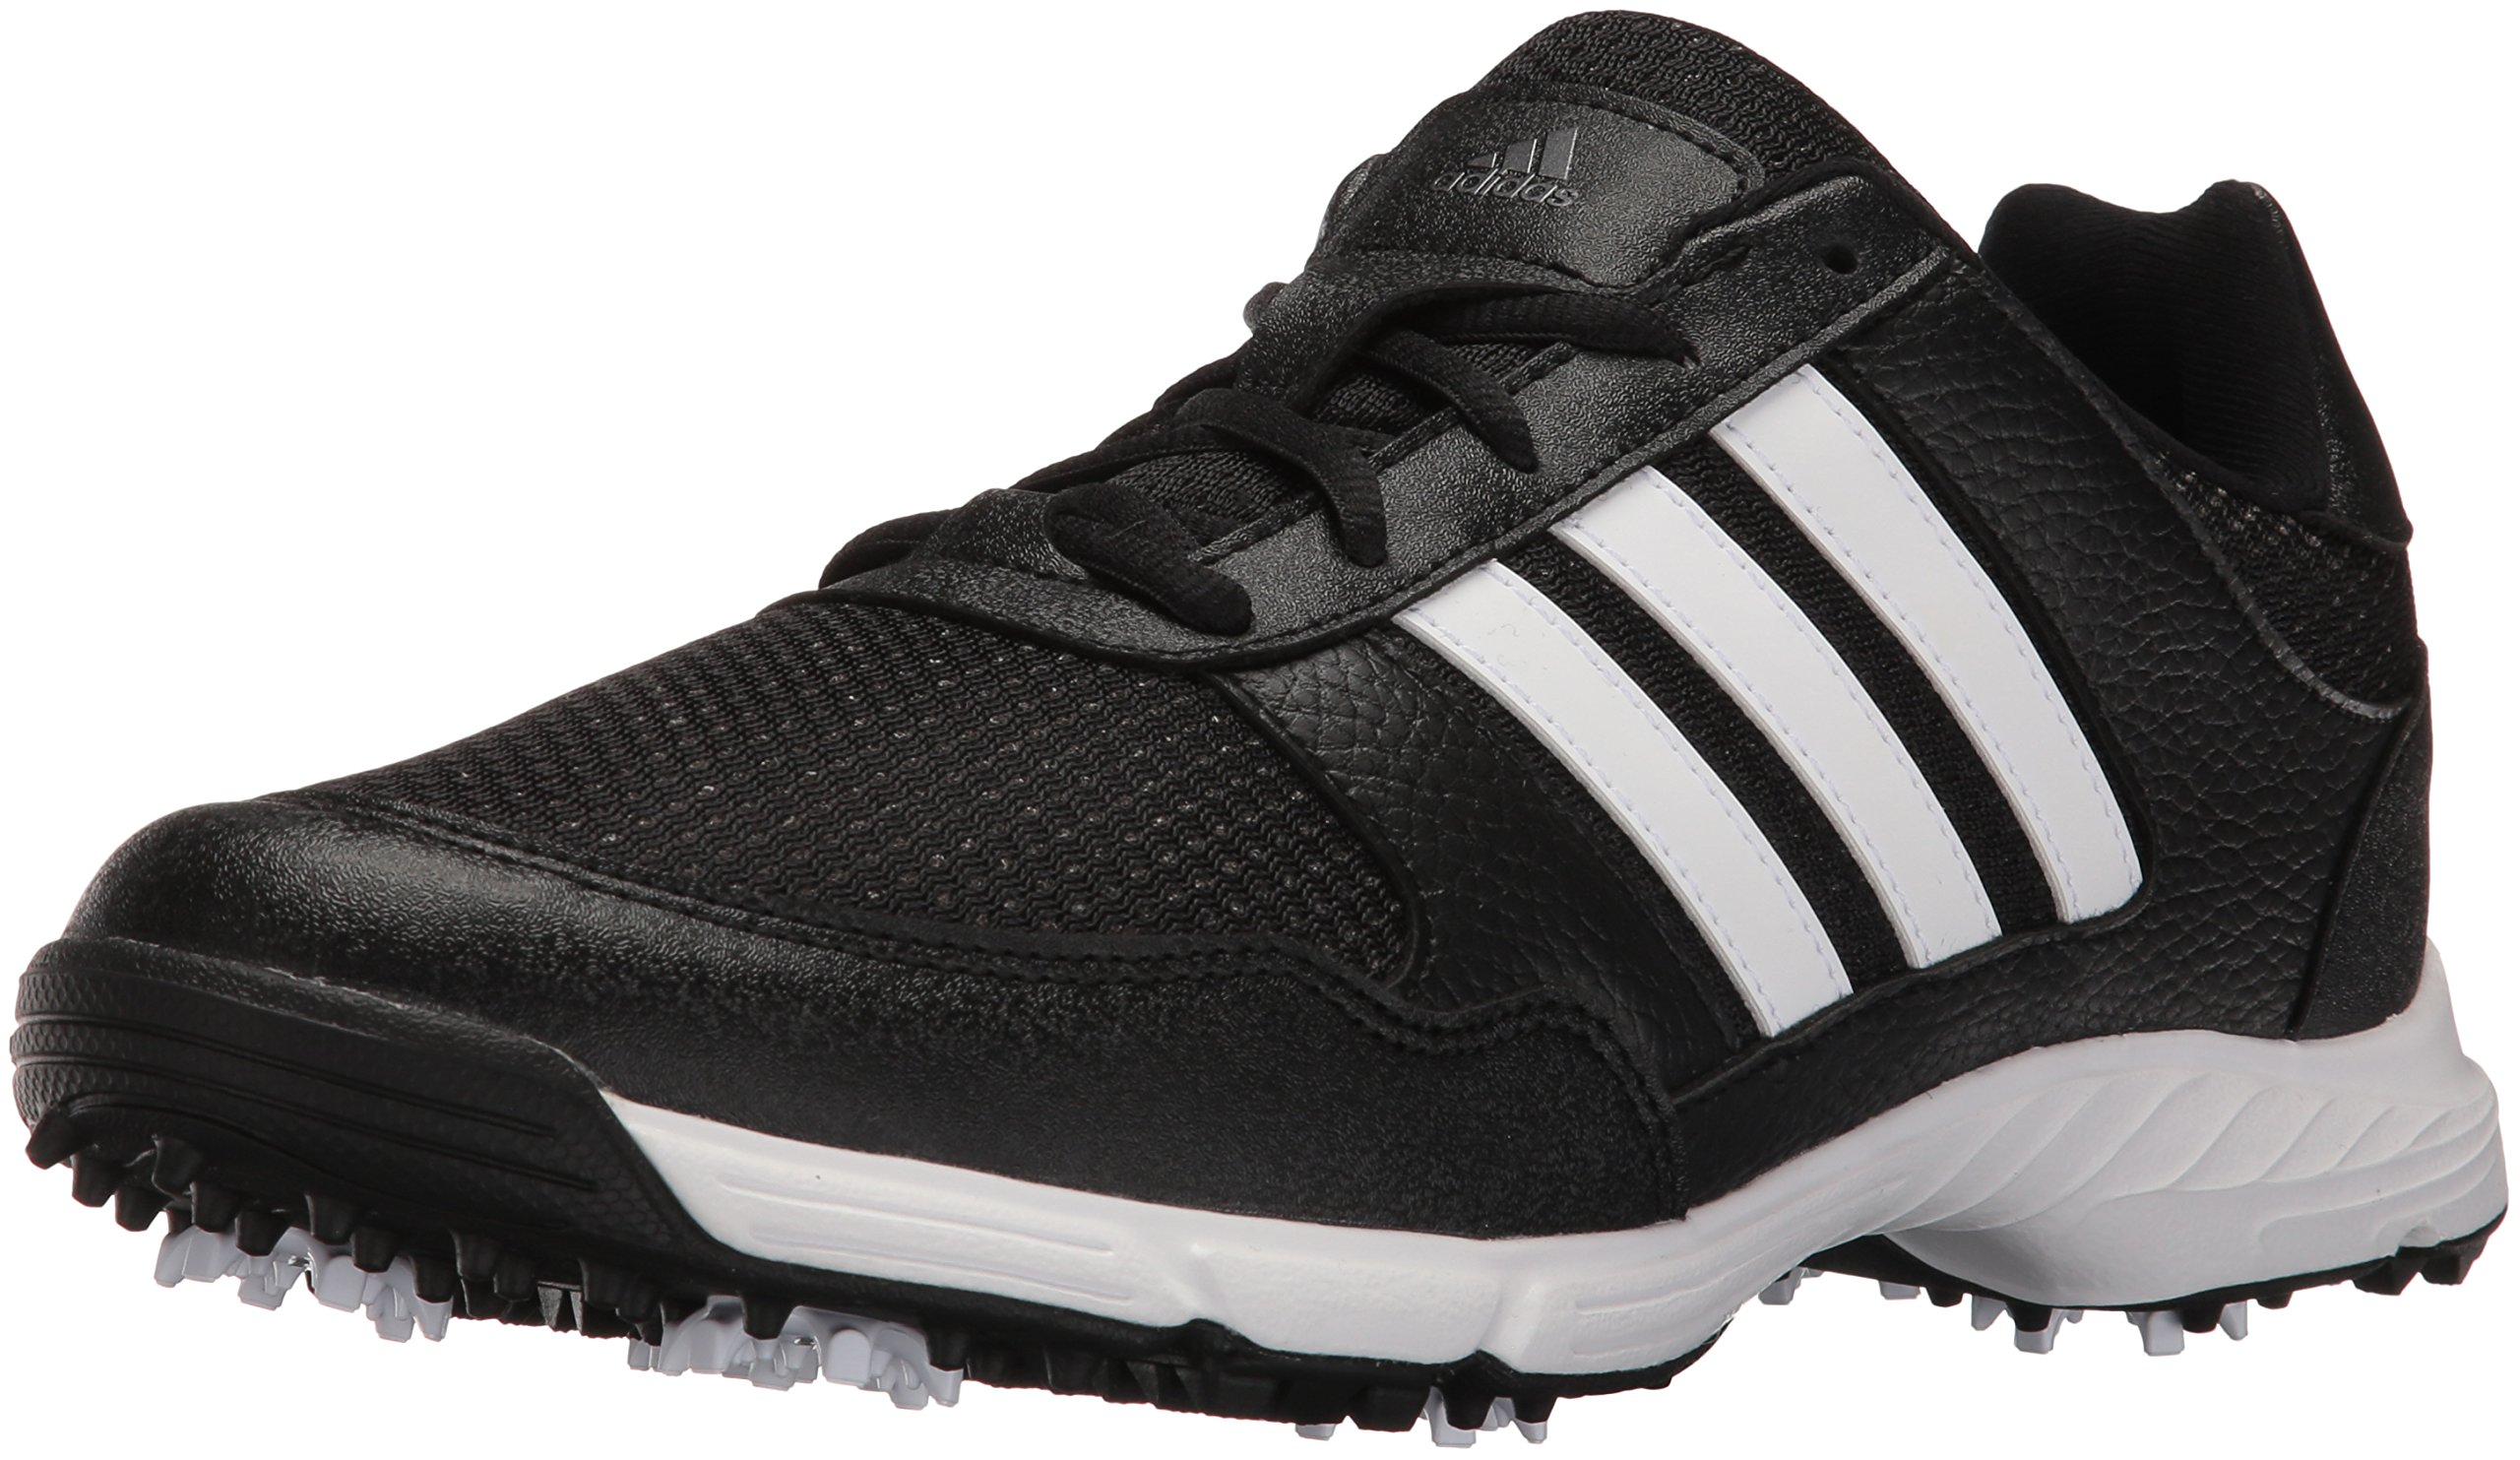 adidas Men's Tech Response Golf Shoe, Black, 11.5 M US